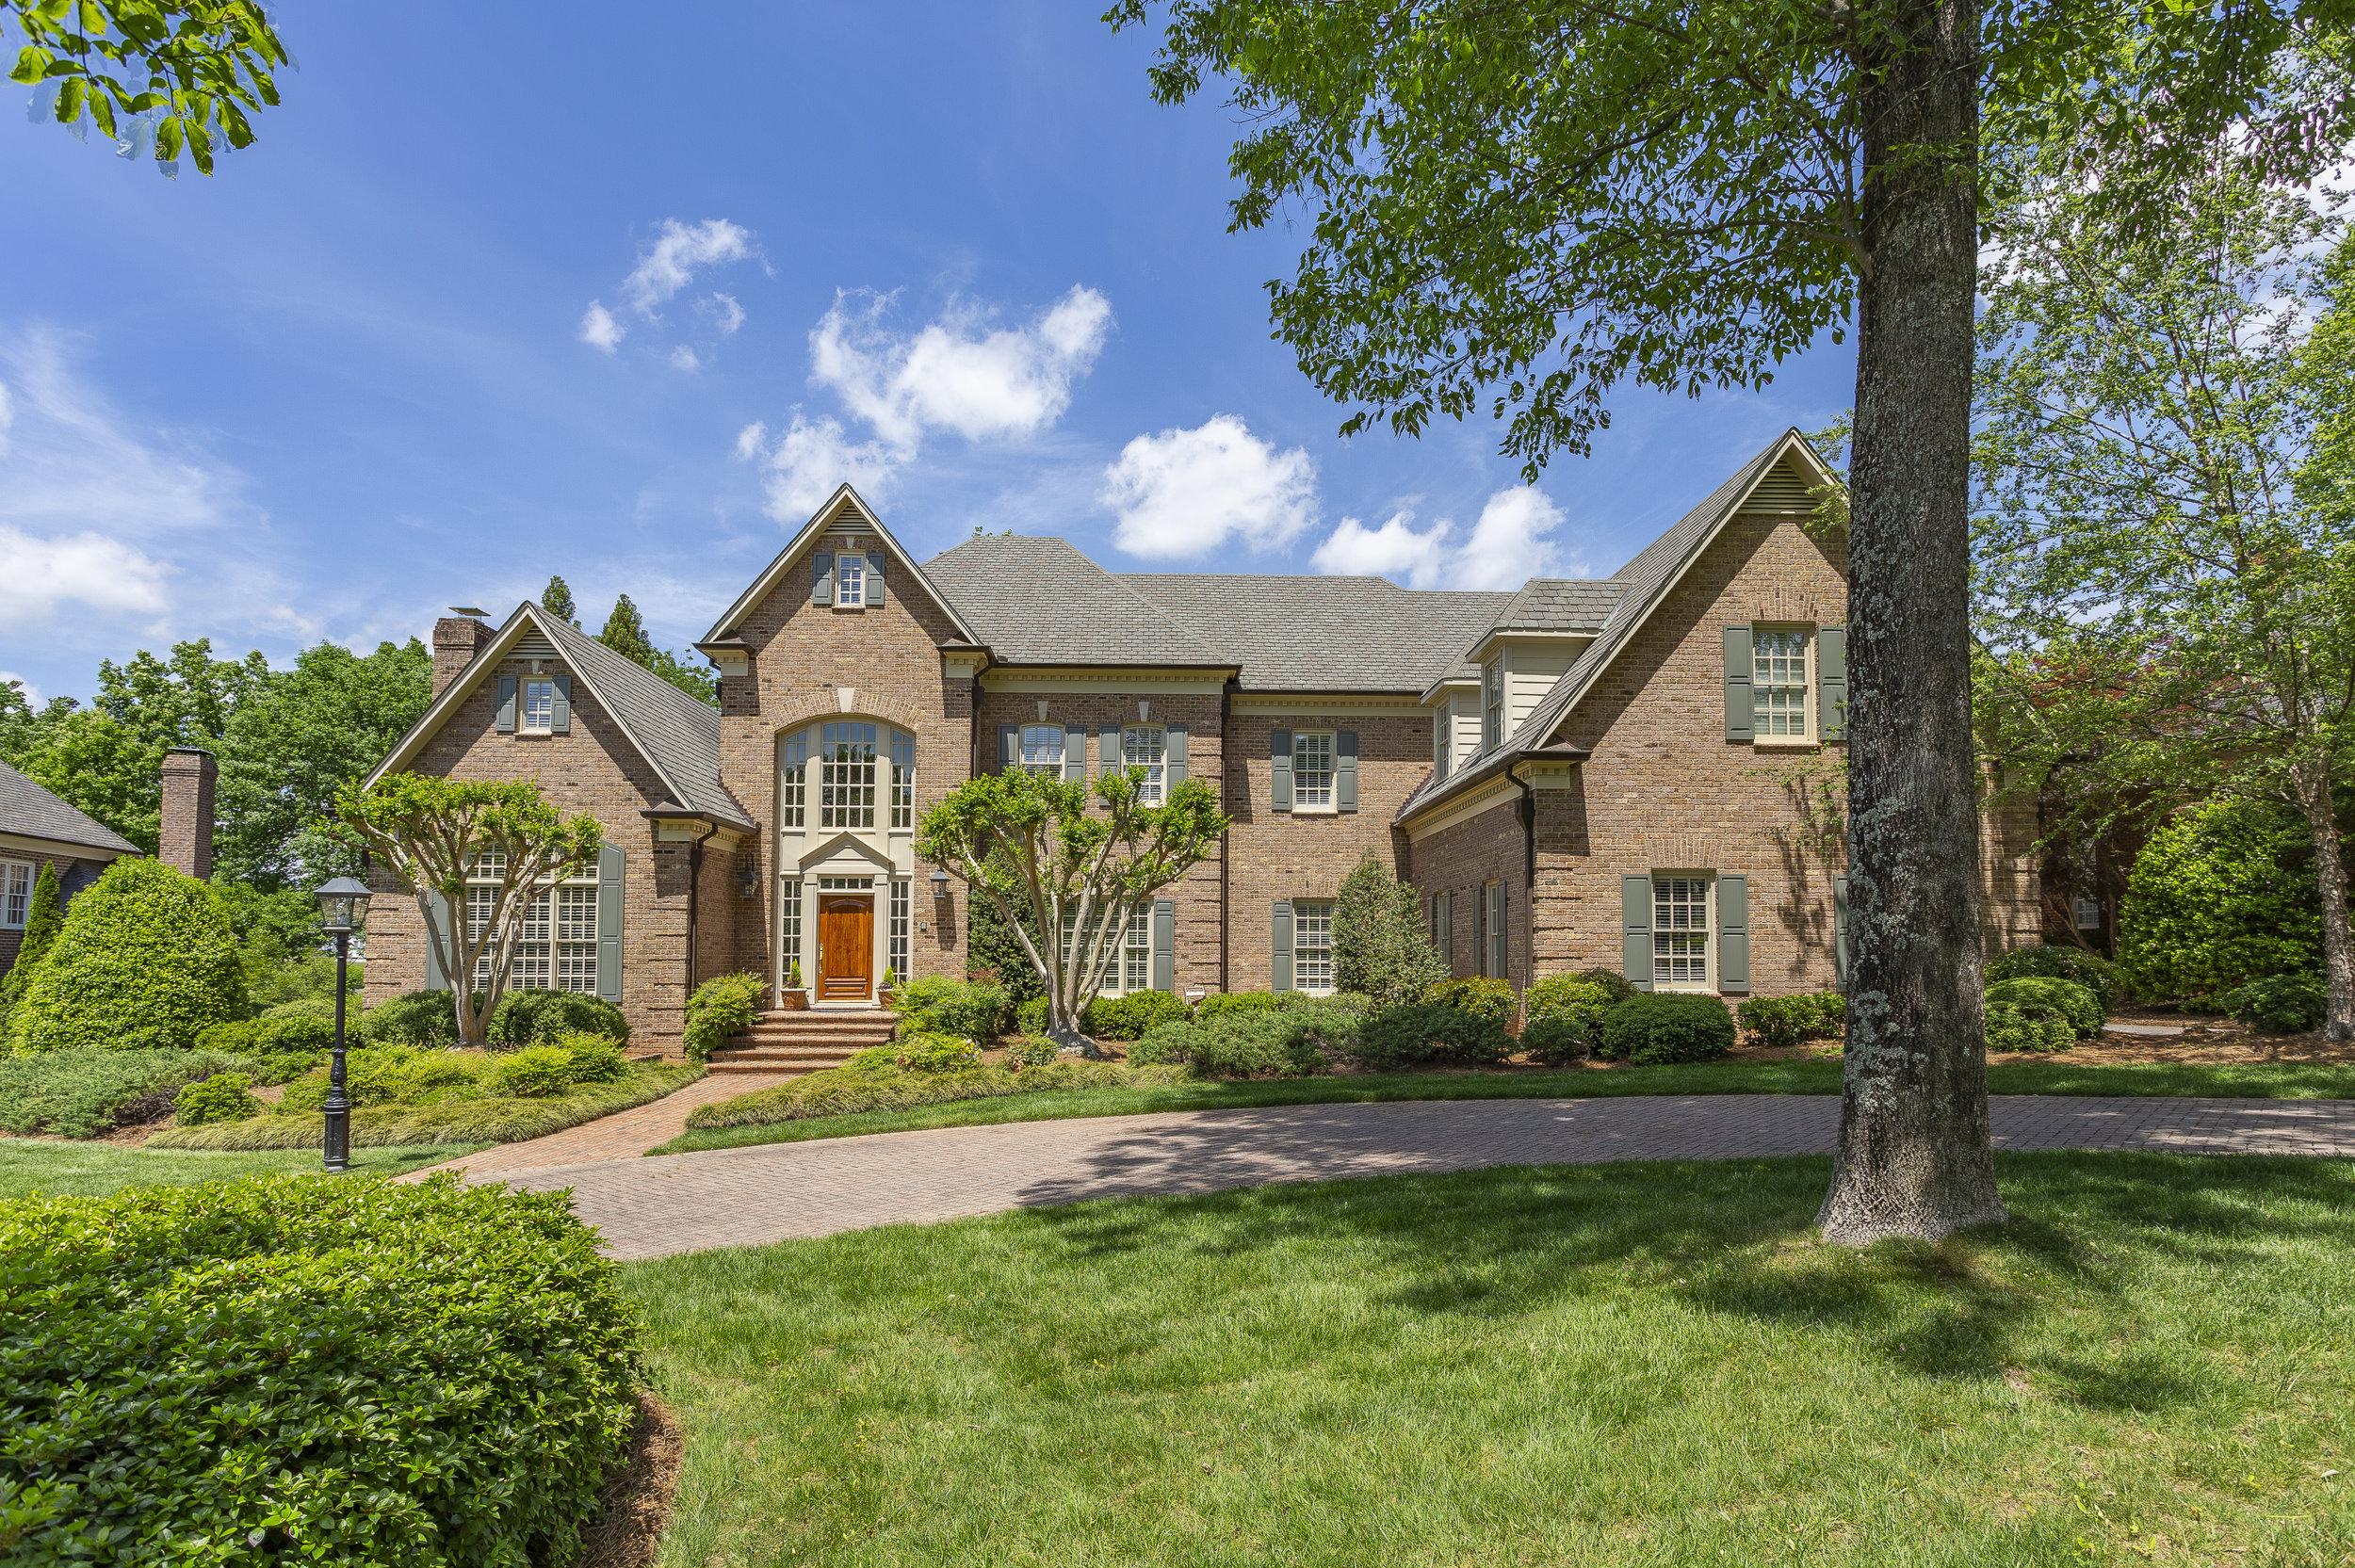 triad-real-estate-photography-drone-aerial-photographer-realtor-high-point-greensboro-kernersville-burlington01.jpg